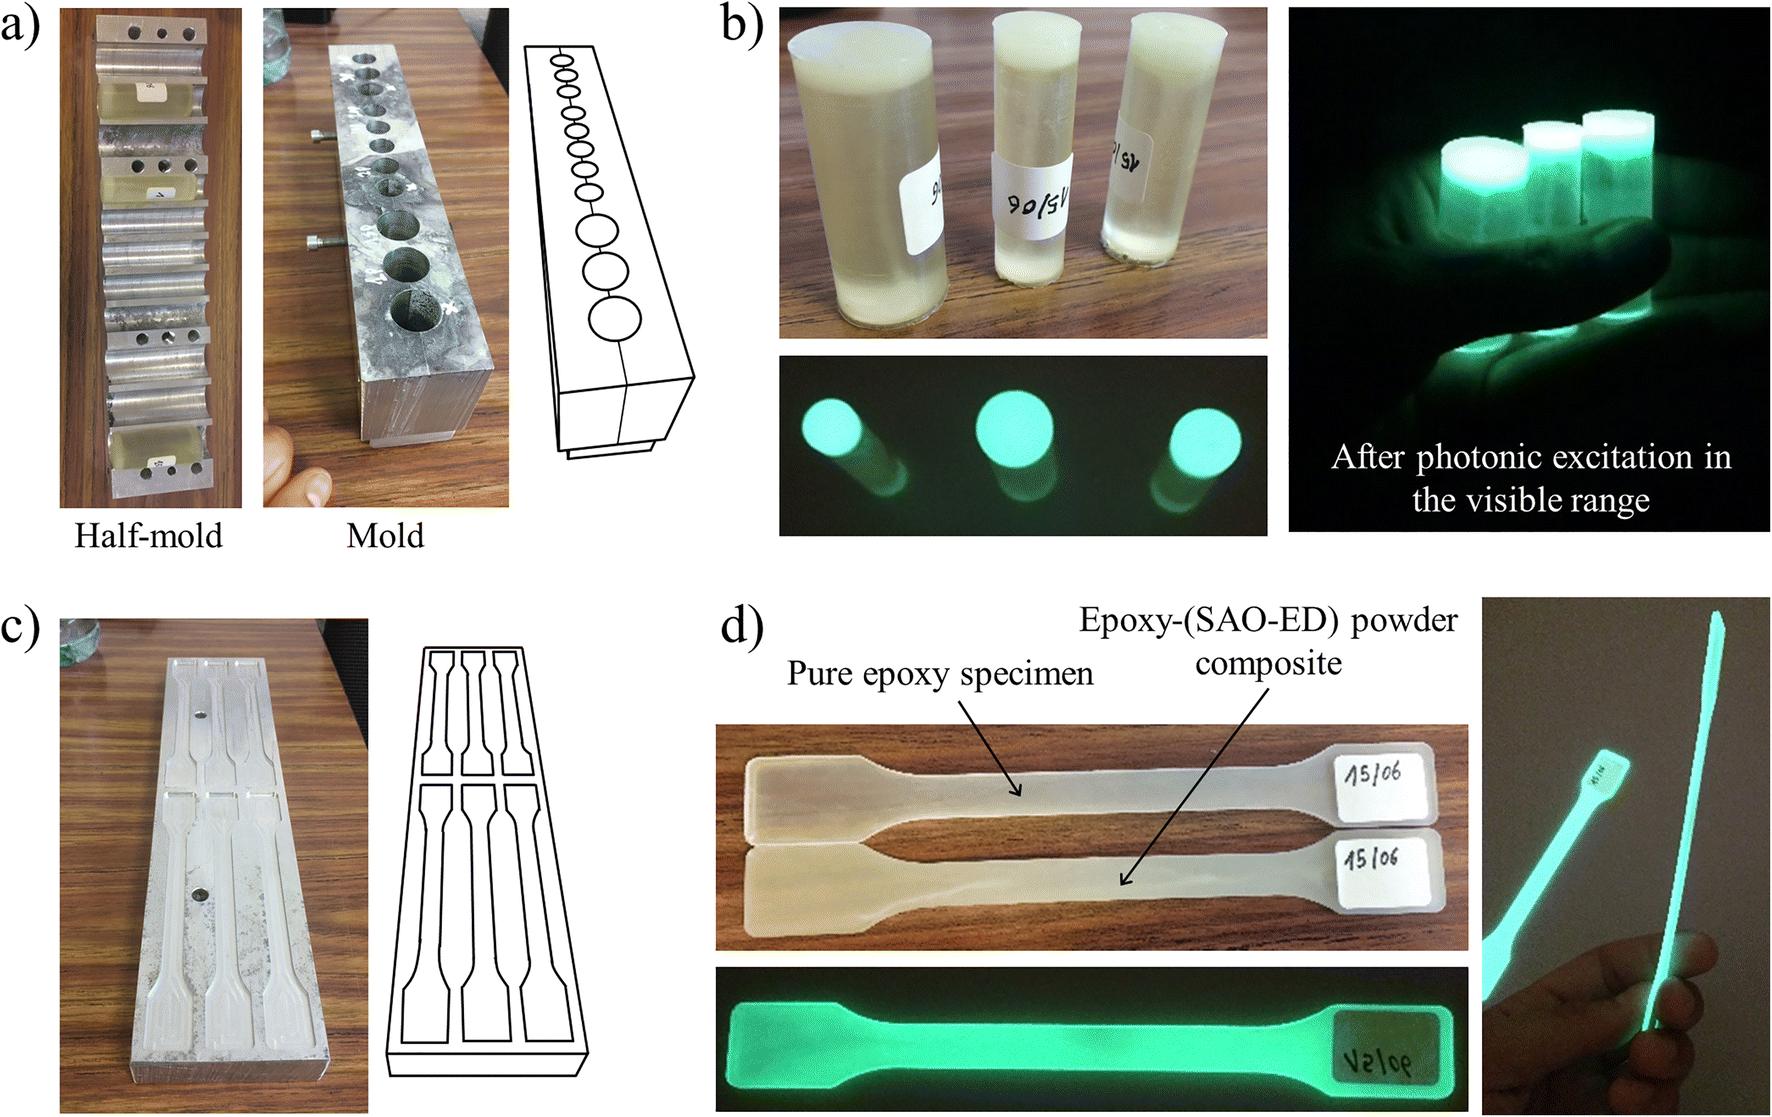 Using Mechanoluminescent Materials to Visualize